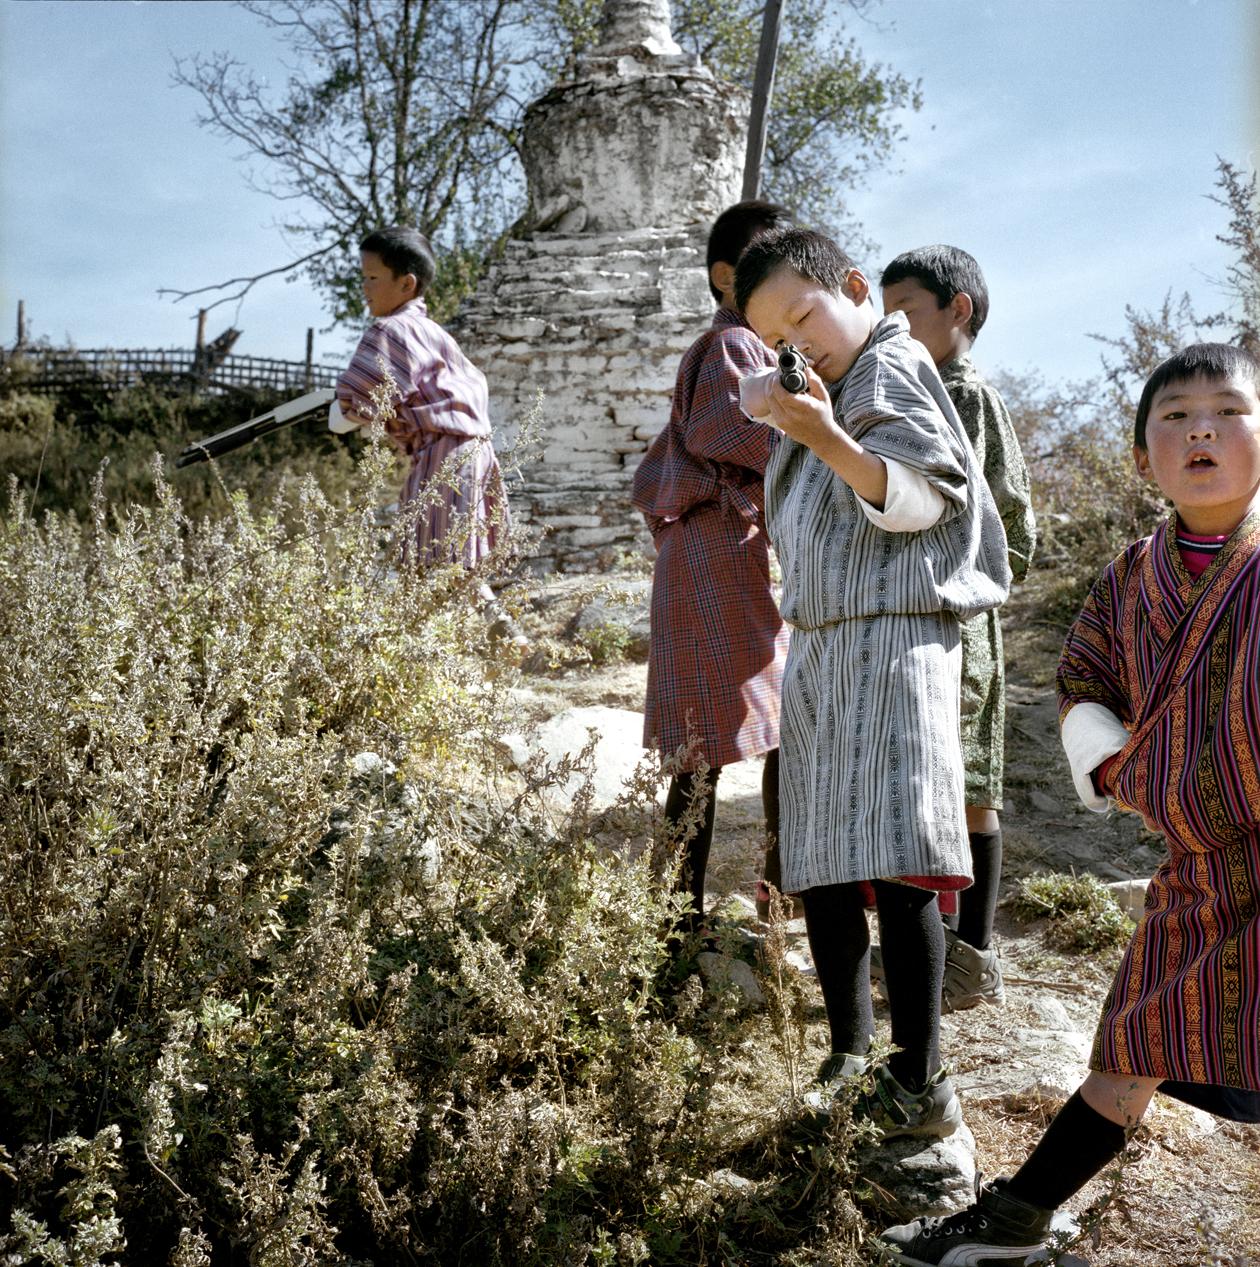 Adrien_Golinelli_Bhutan_04.jpg